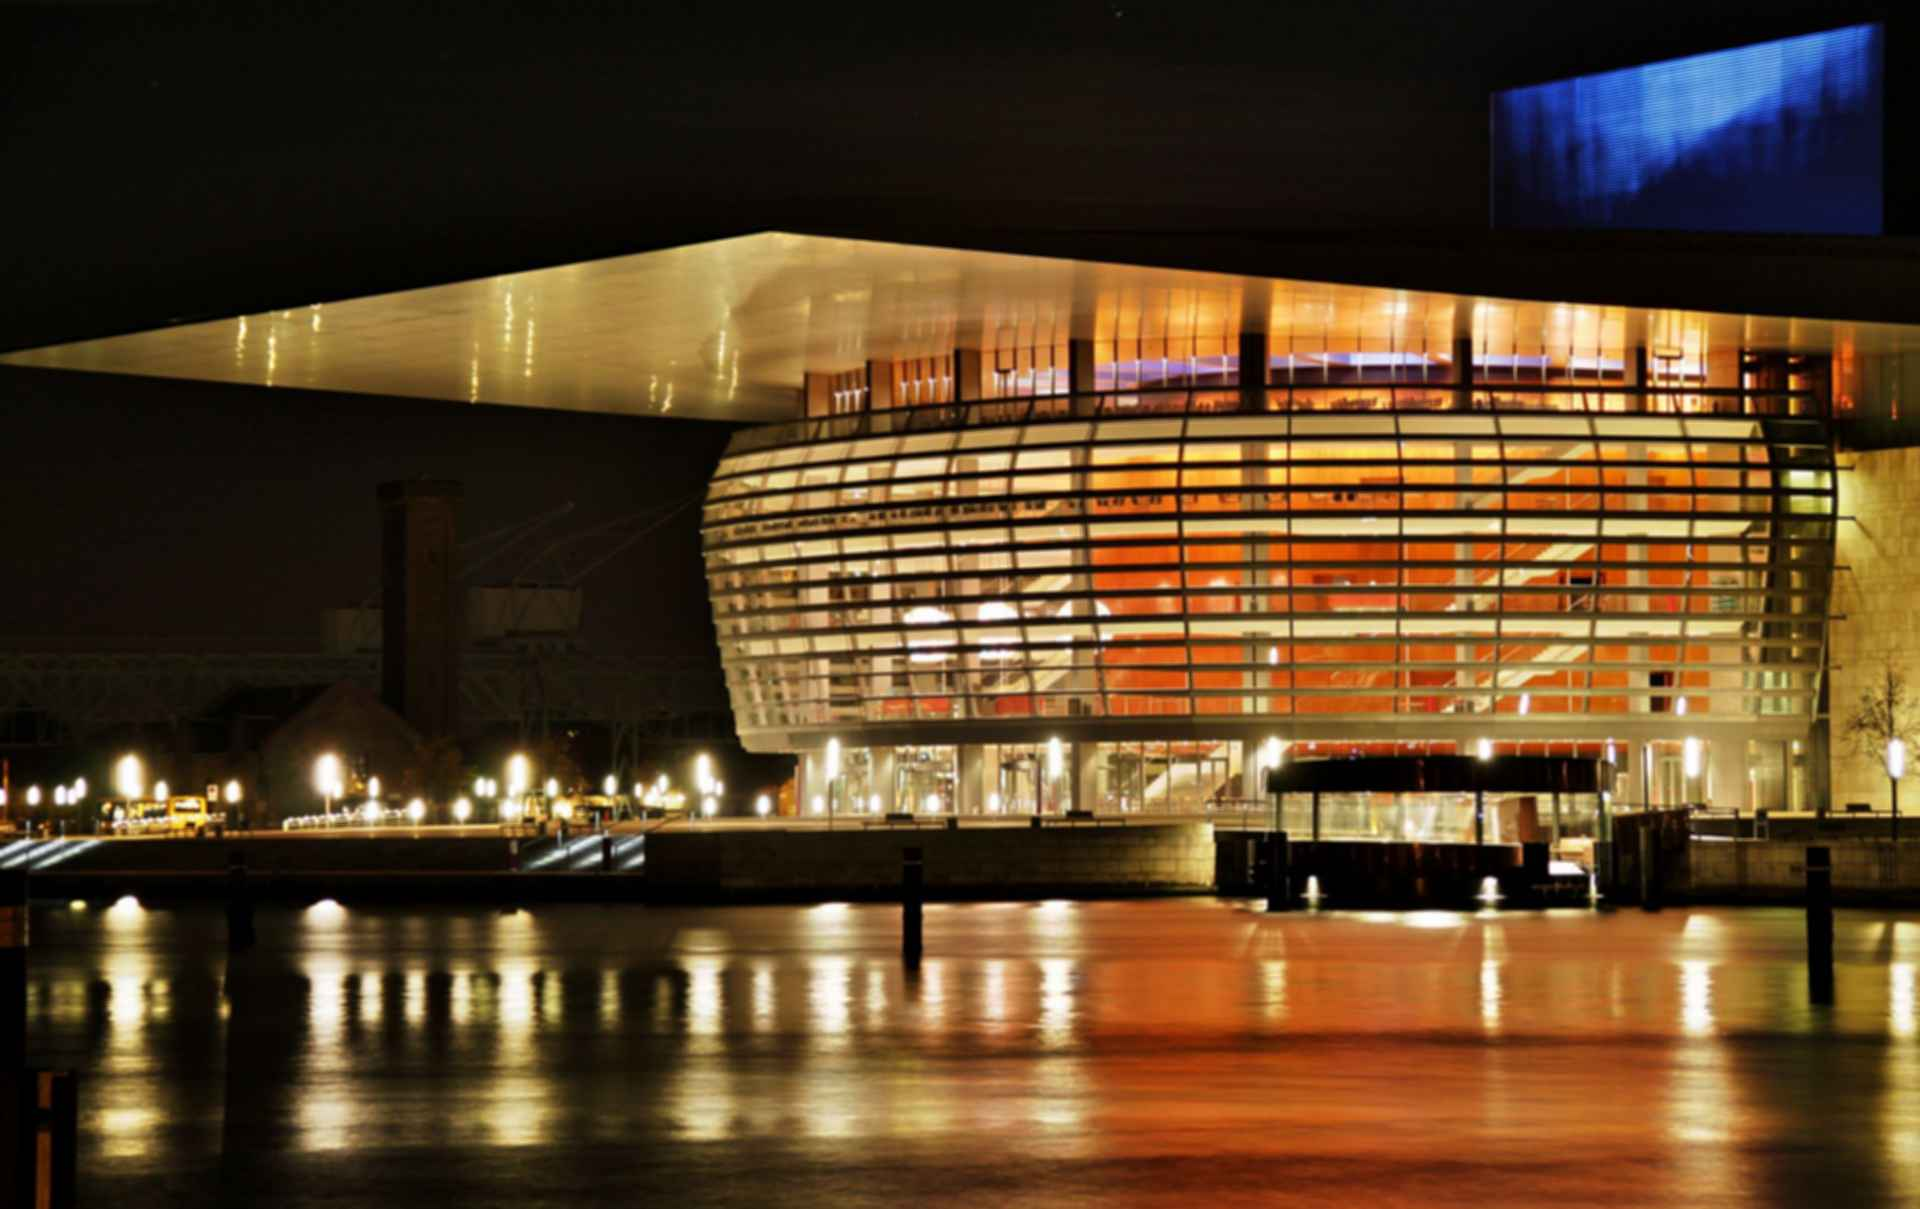 Copenhagen Opera House - Exterior Night